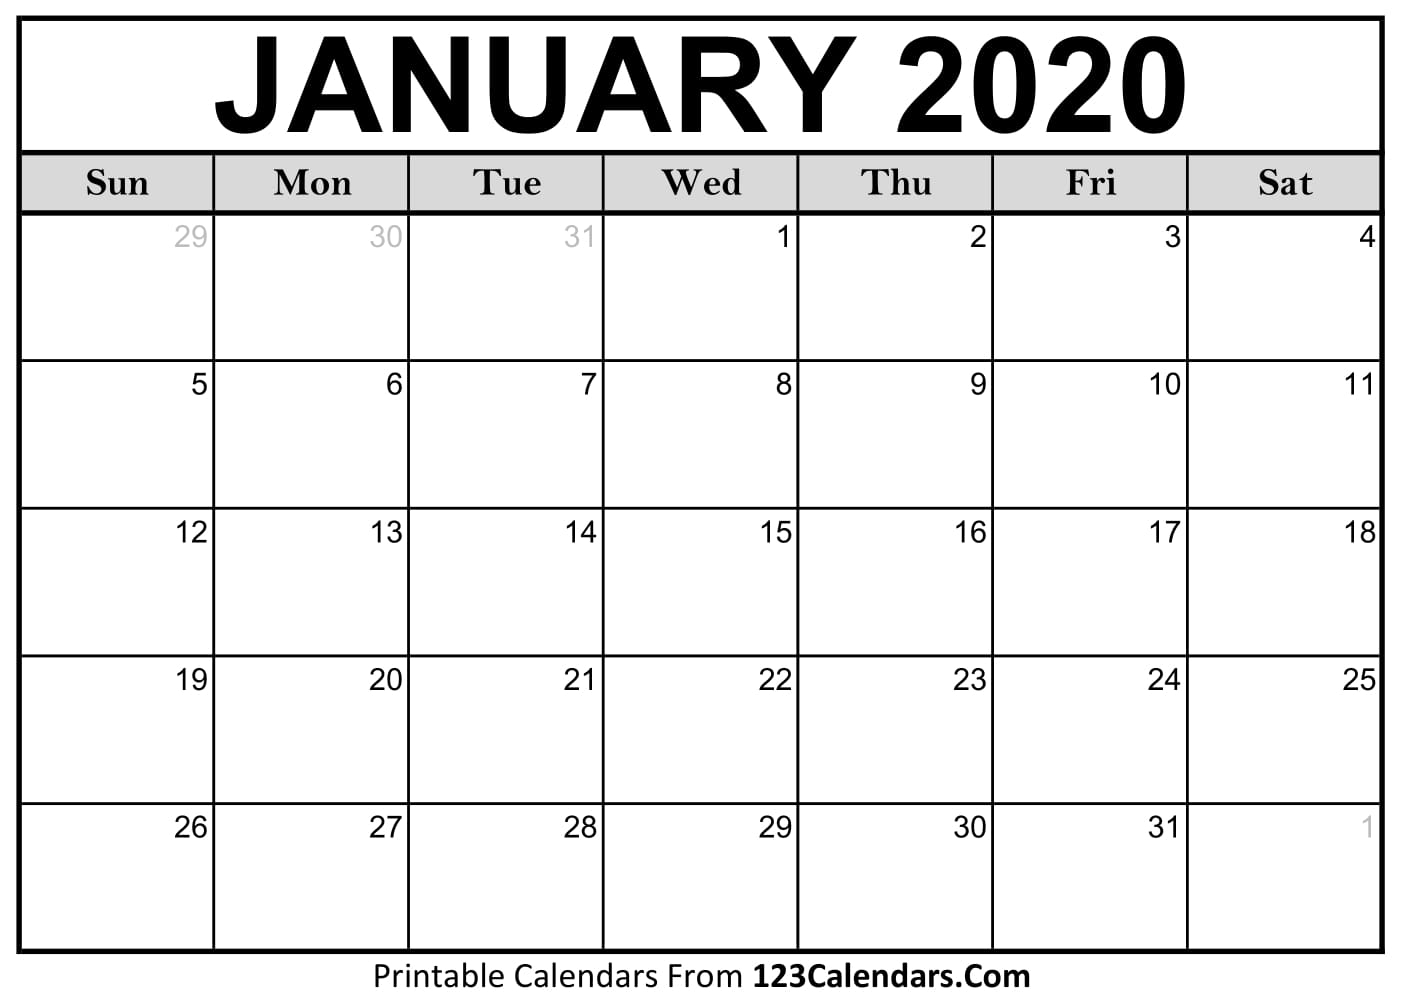 Free Printable Calendar | 123Calendars-Printabe Monthly